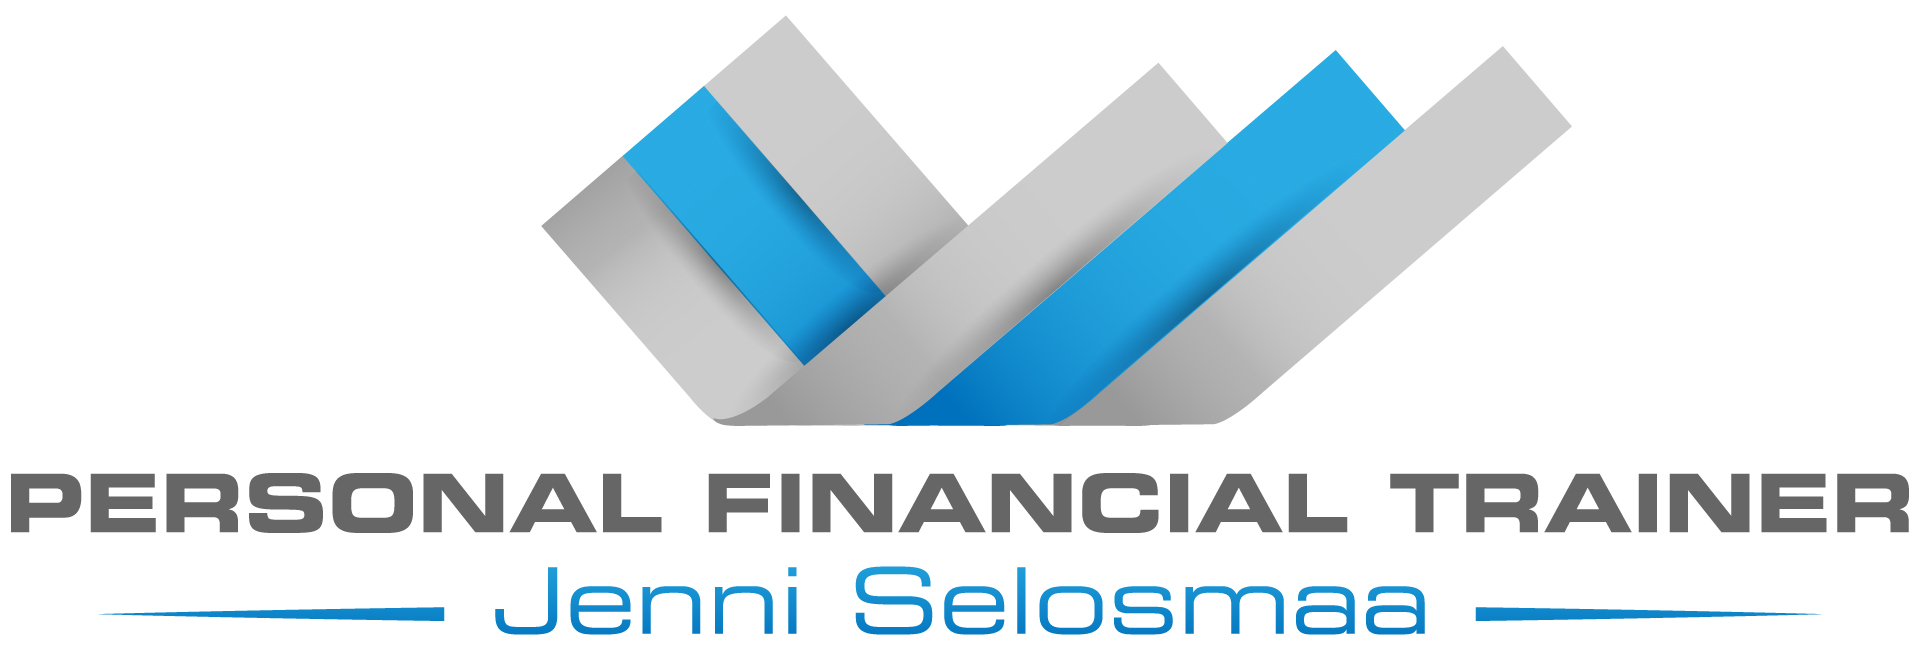 PersonalFinancialTrainerREV2.jpg